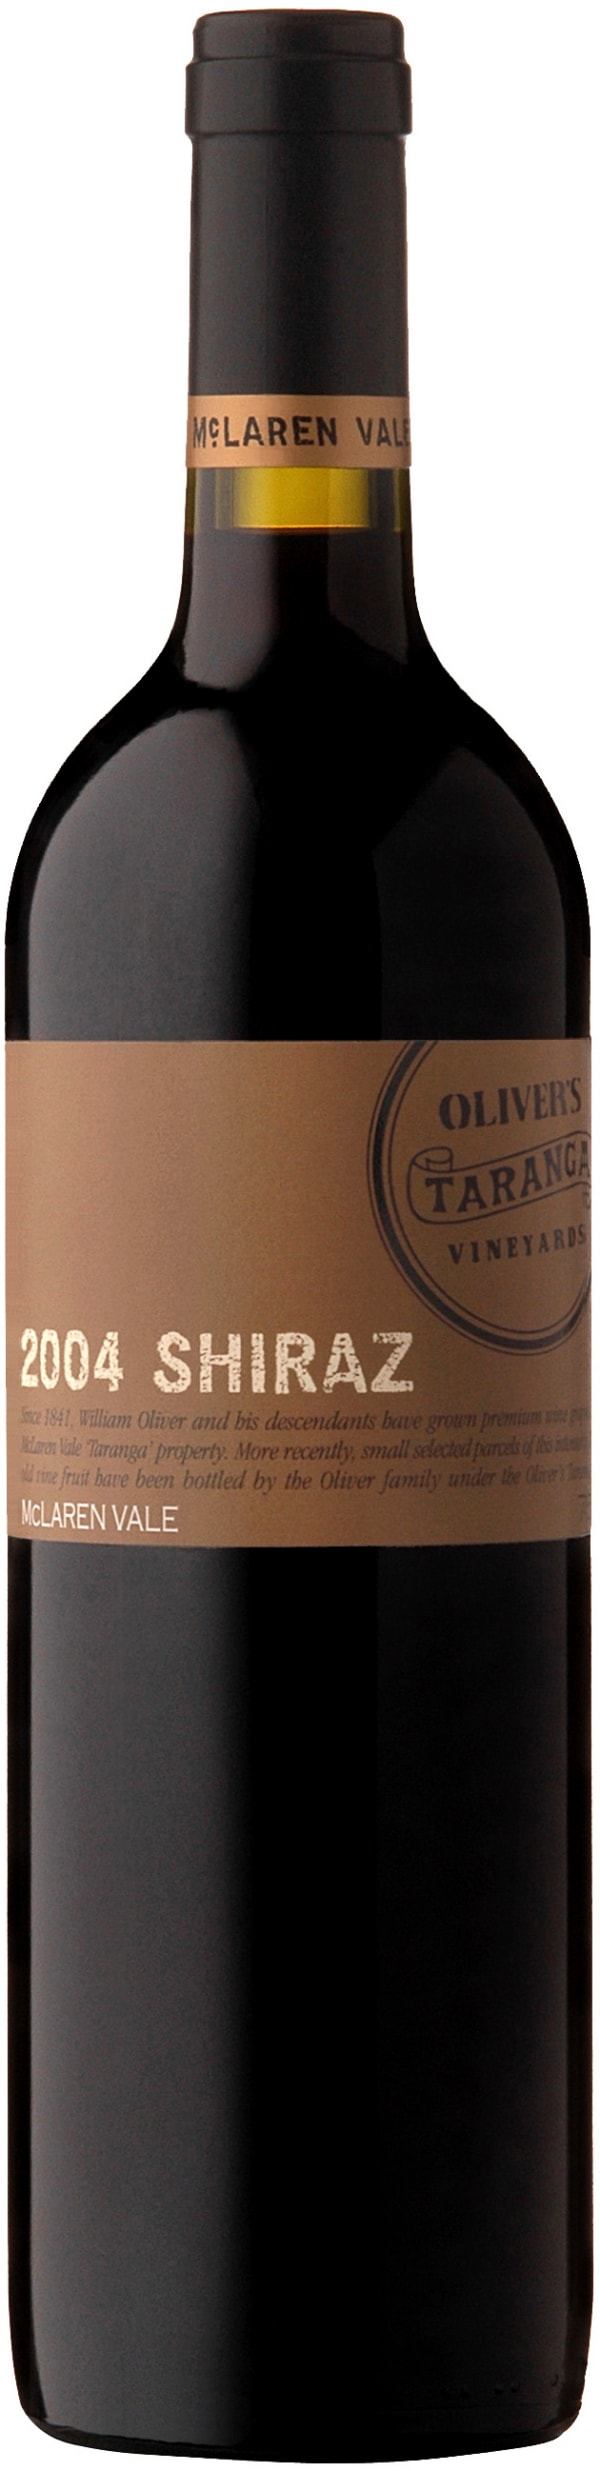 Oliver's Taranga McLaren Vale Shiraz 2002